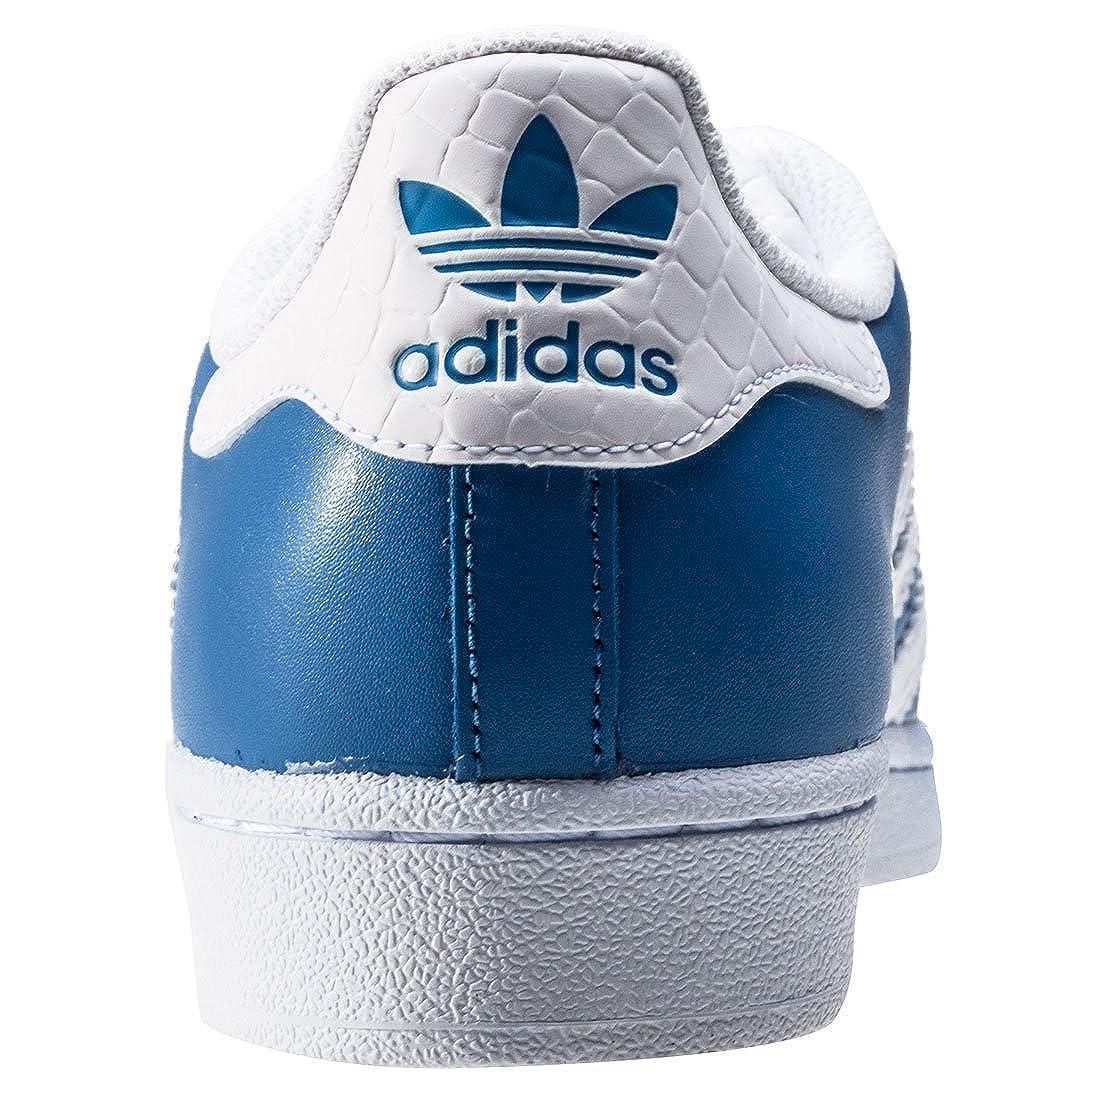 the best attitude 48f92 e6e9b Adidas - Basket Superstar S75880 BlancNoir adidas Originals Amazon.fr  Chaussures et Sacs